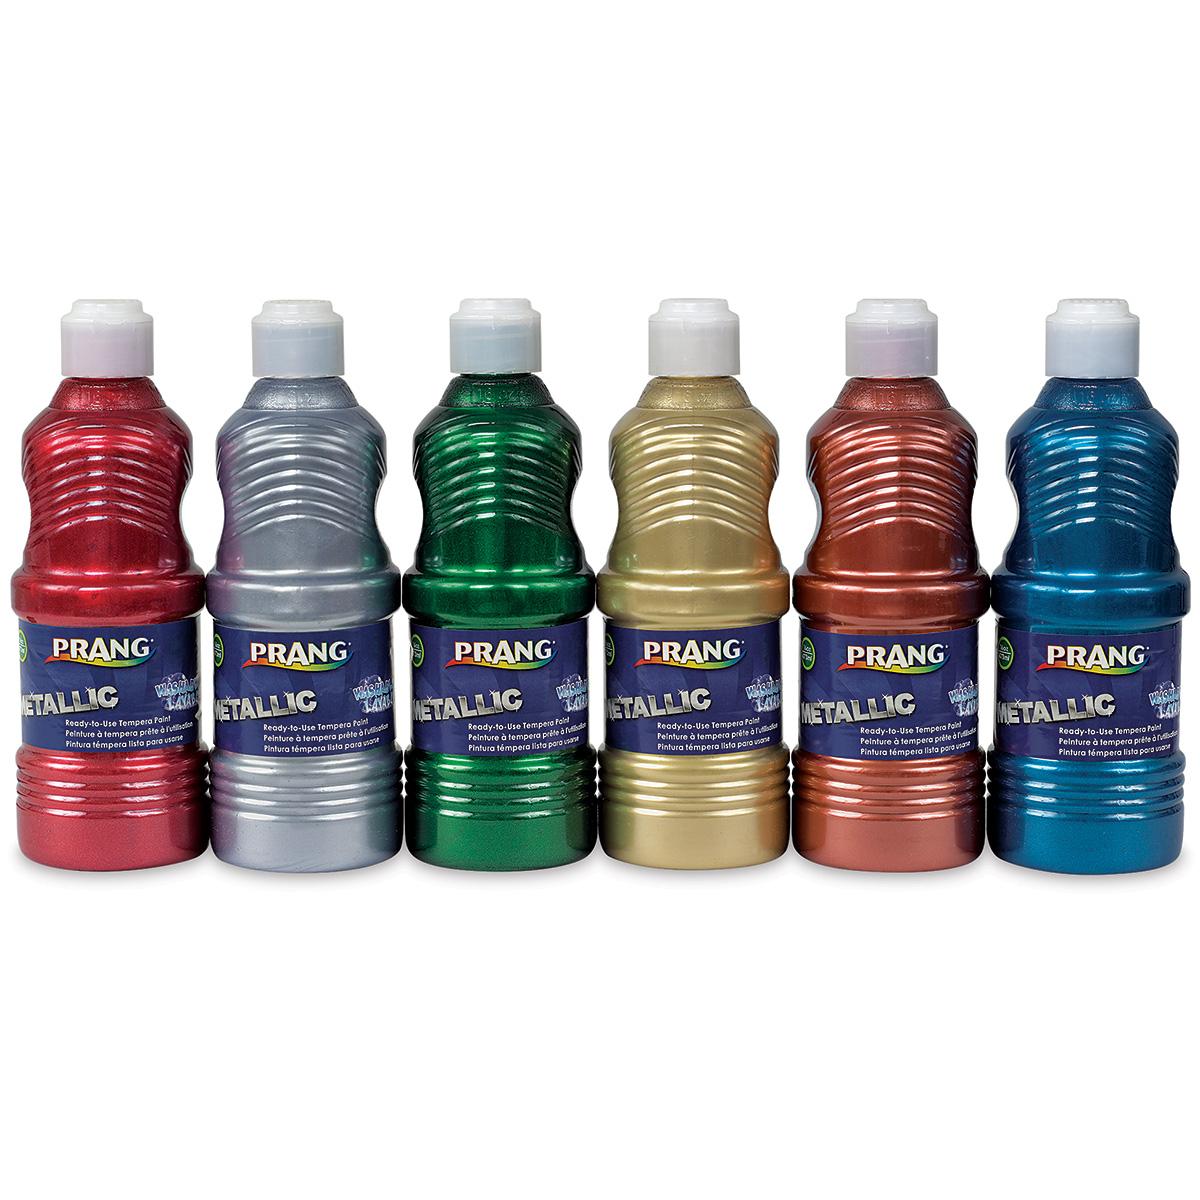 Prang Ready-To-Use Washable Tempera Paints - Metallics, Set of 6 colors, 16 oz bottles